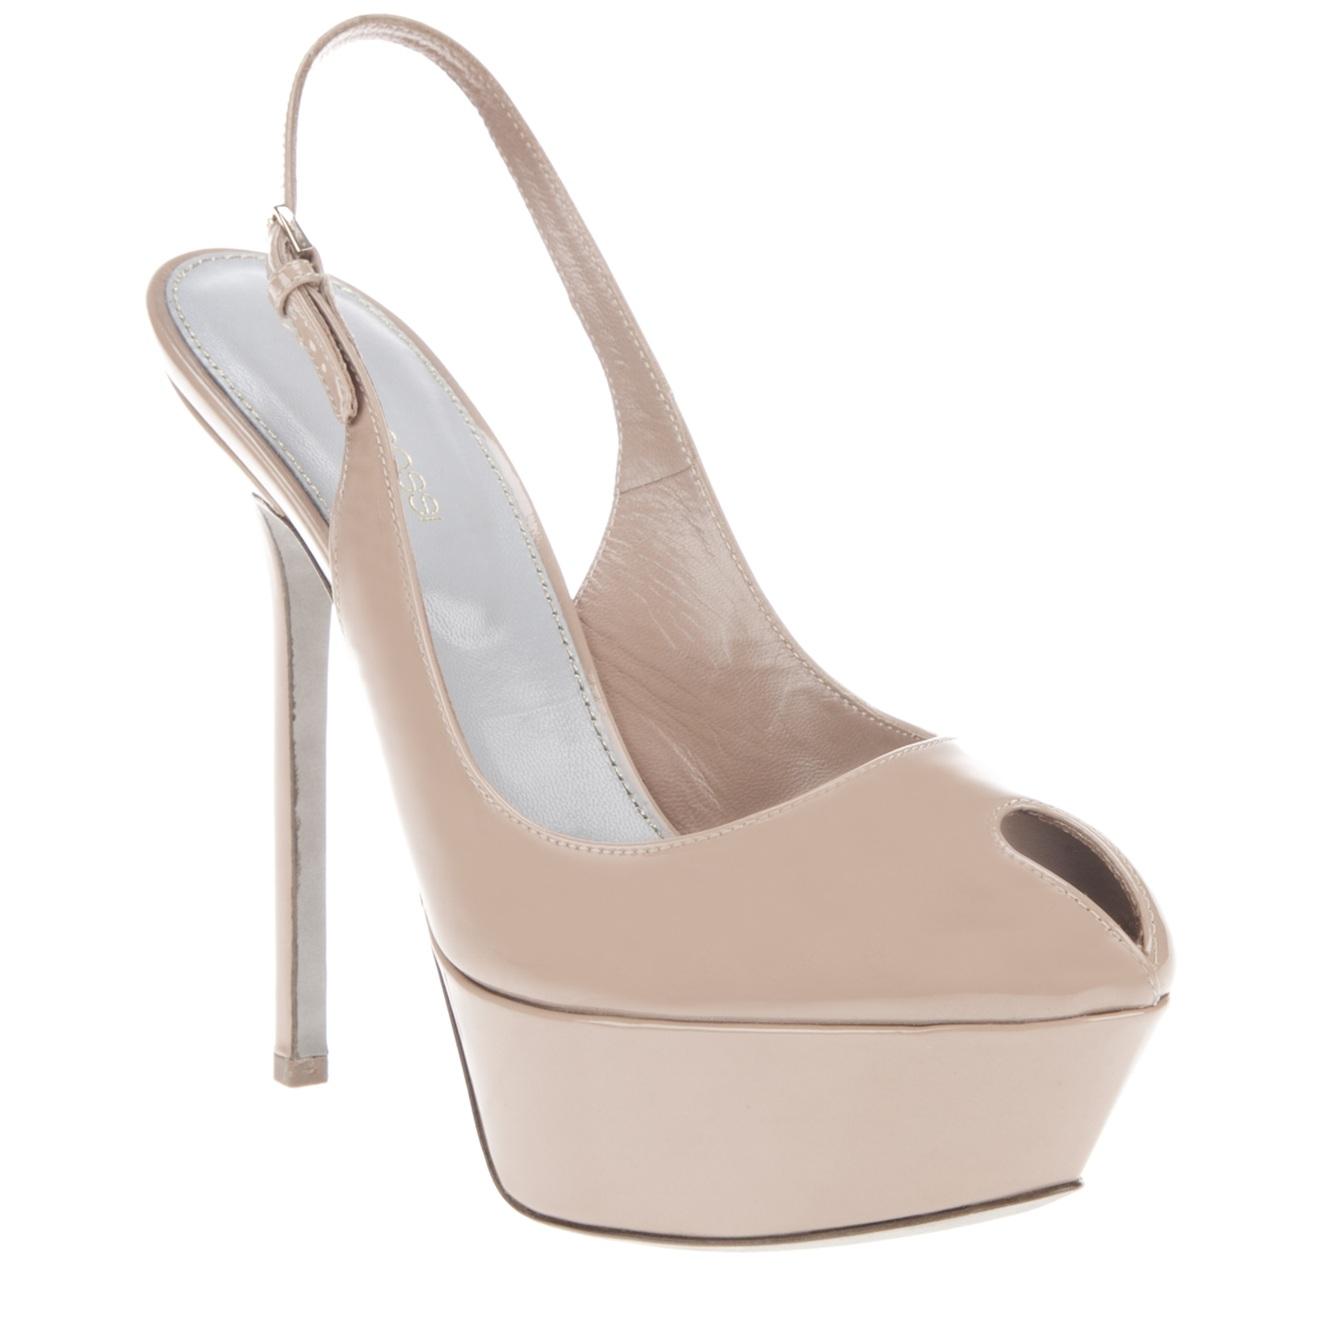 sergio peep toe platform shoe in beige lyst